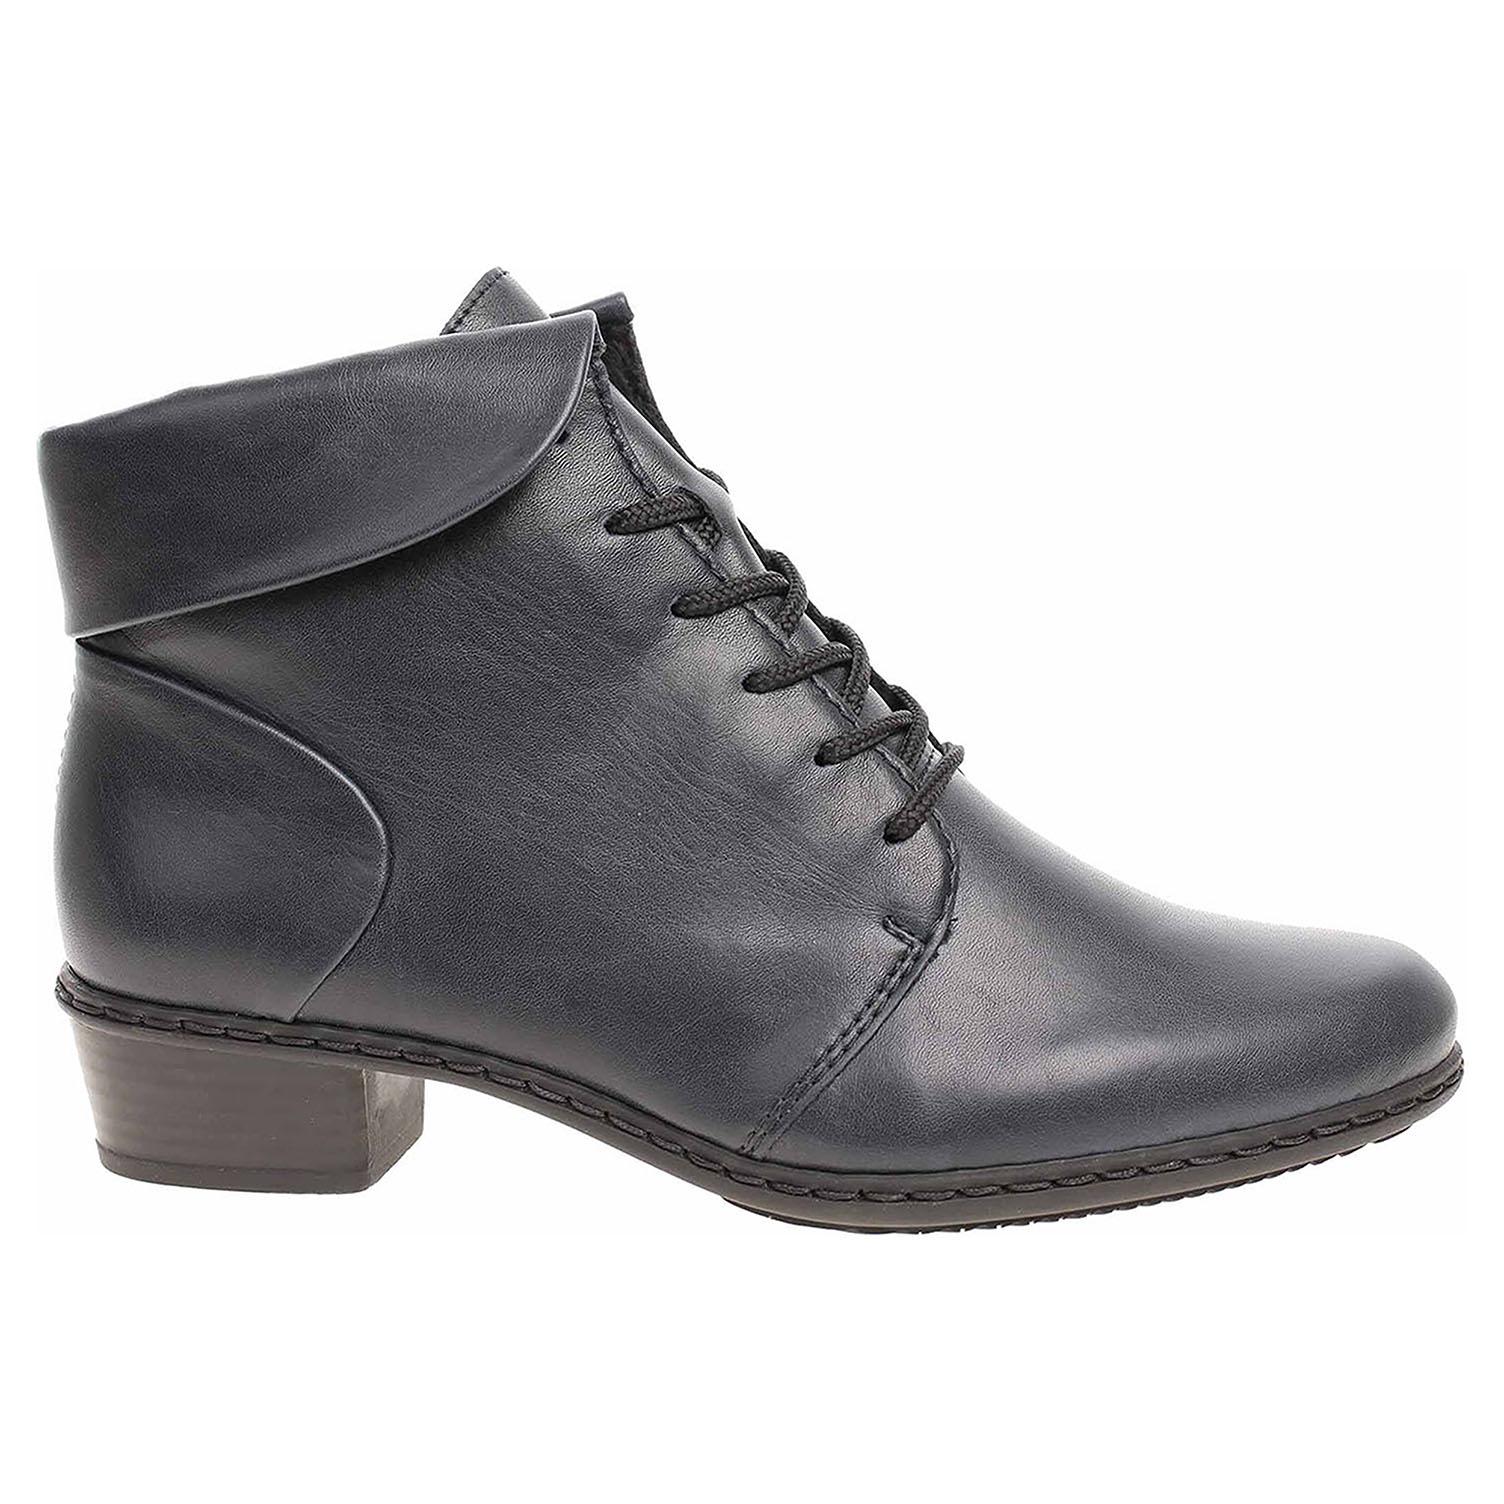 Dámská kotníková obuv Rieker Y0711-14 blau Y0711-14 39